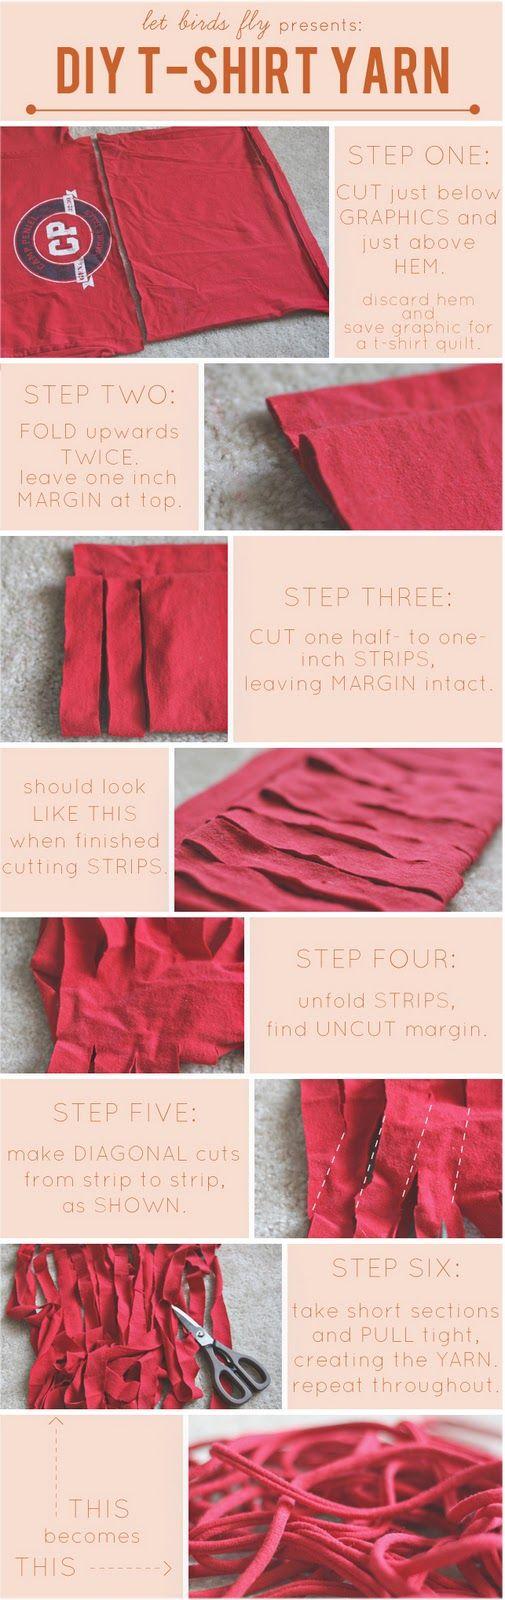 tshirt yarnT Shirts Yarns, Ideas, Tees Shirts, Crochet, Tshirt Yarns, Diy T Shirts, How To, Knits, Crafts